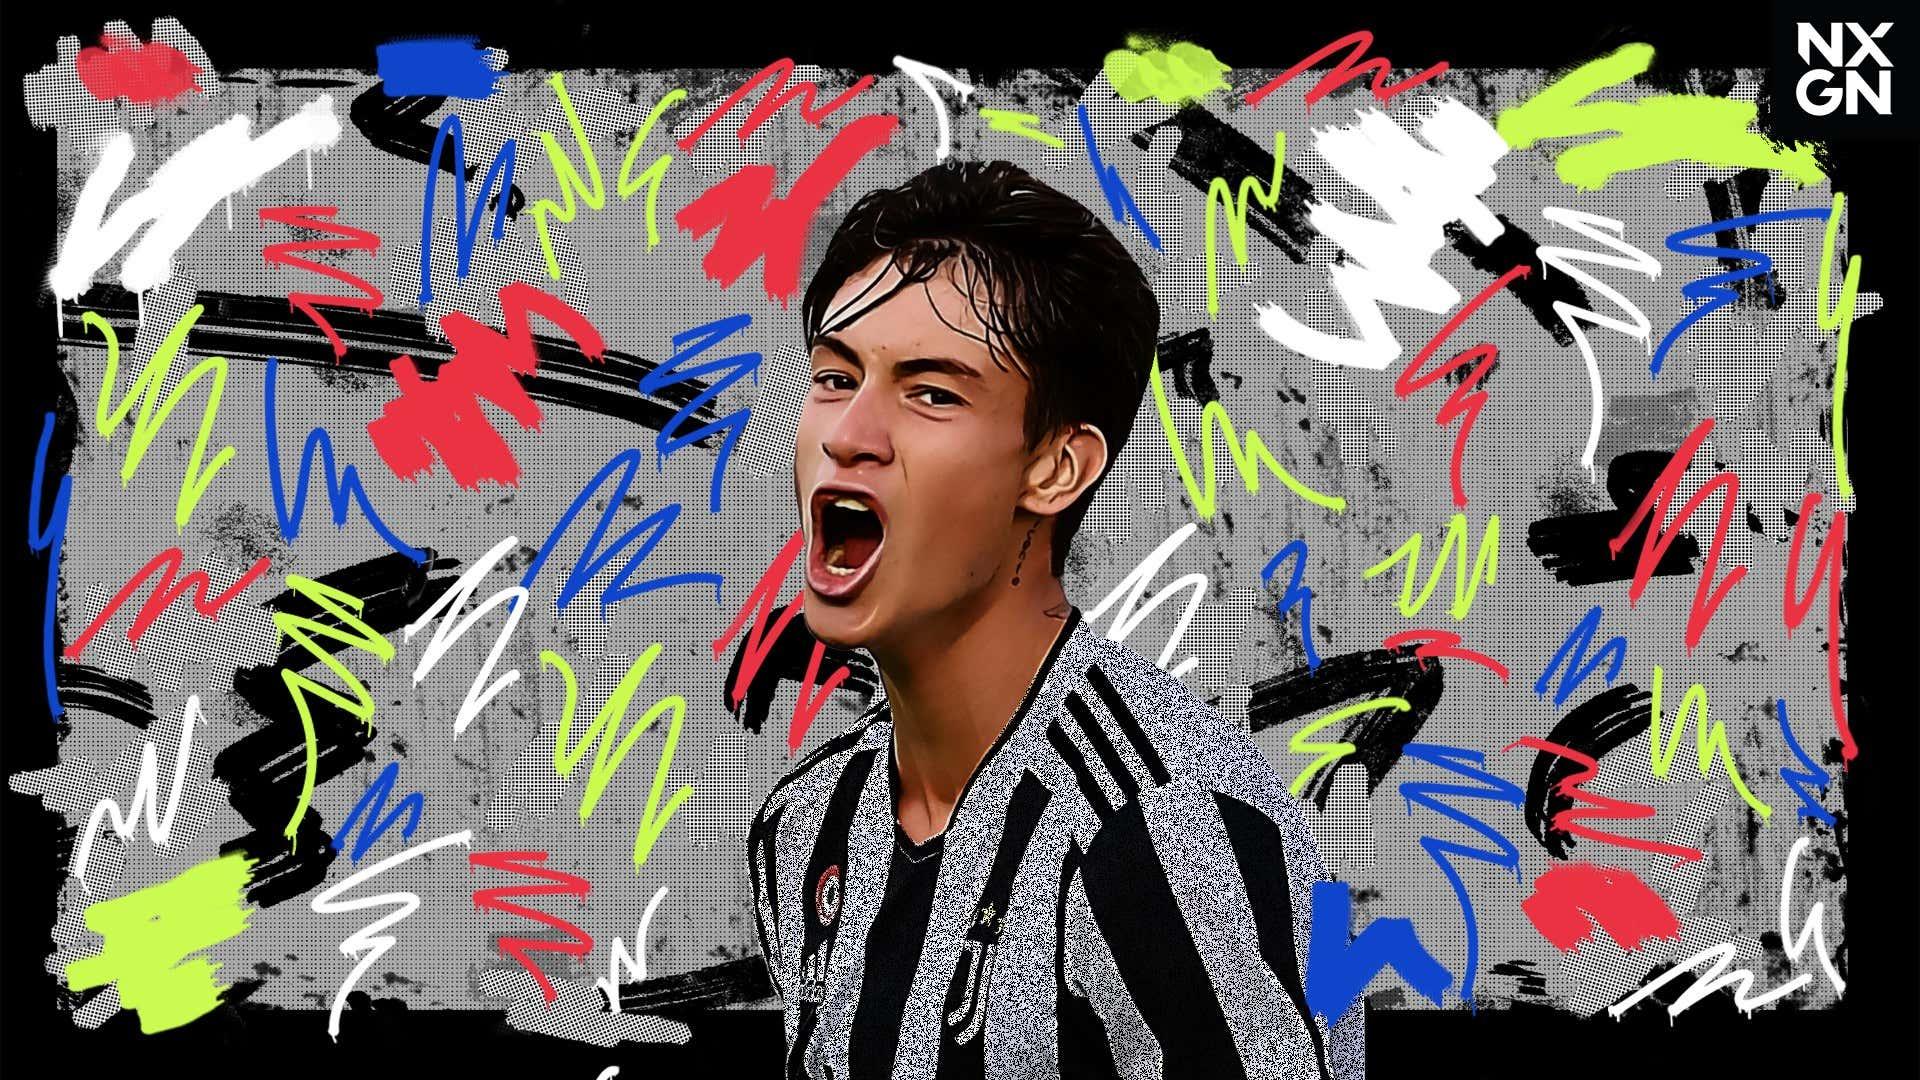 Matias Soule: Juventus wonderkid dubbed 'the new Di Maria' | Goal.com